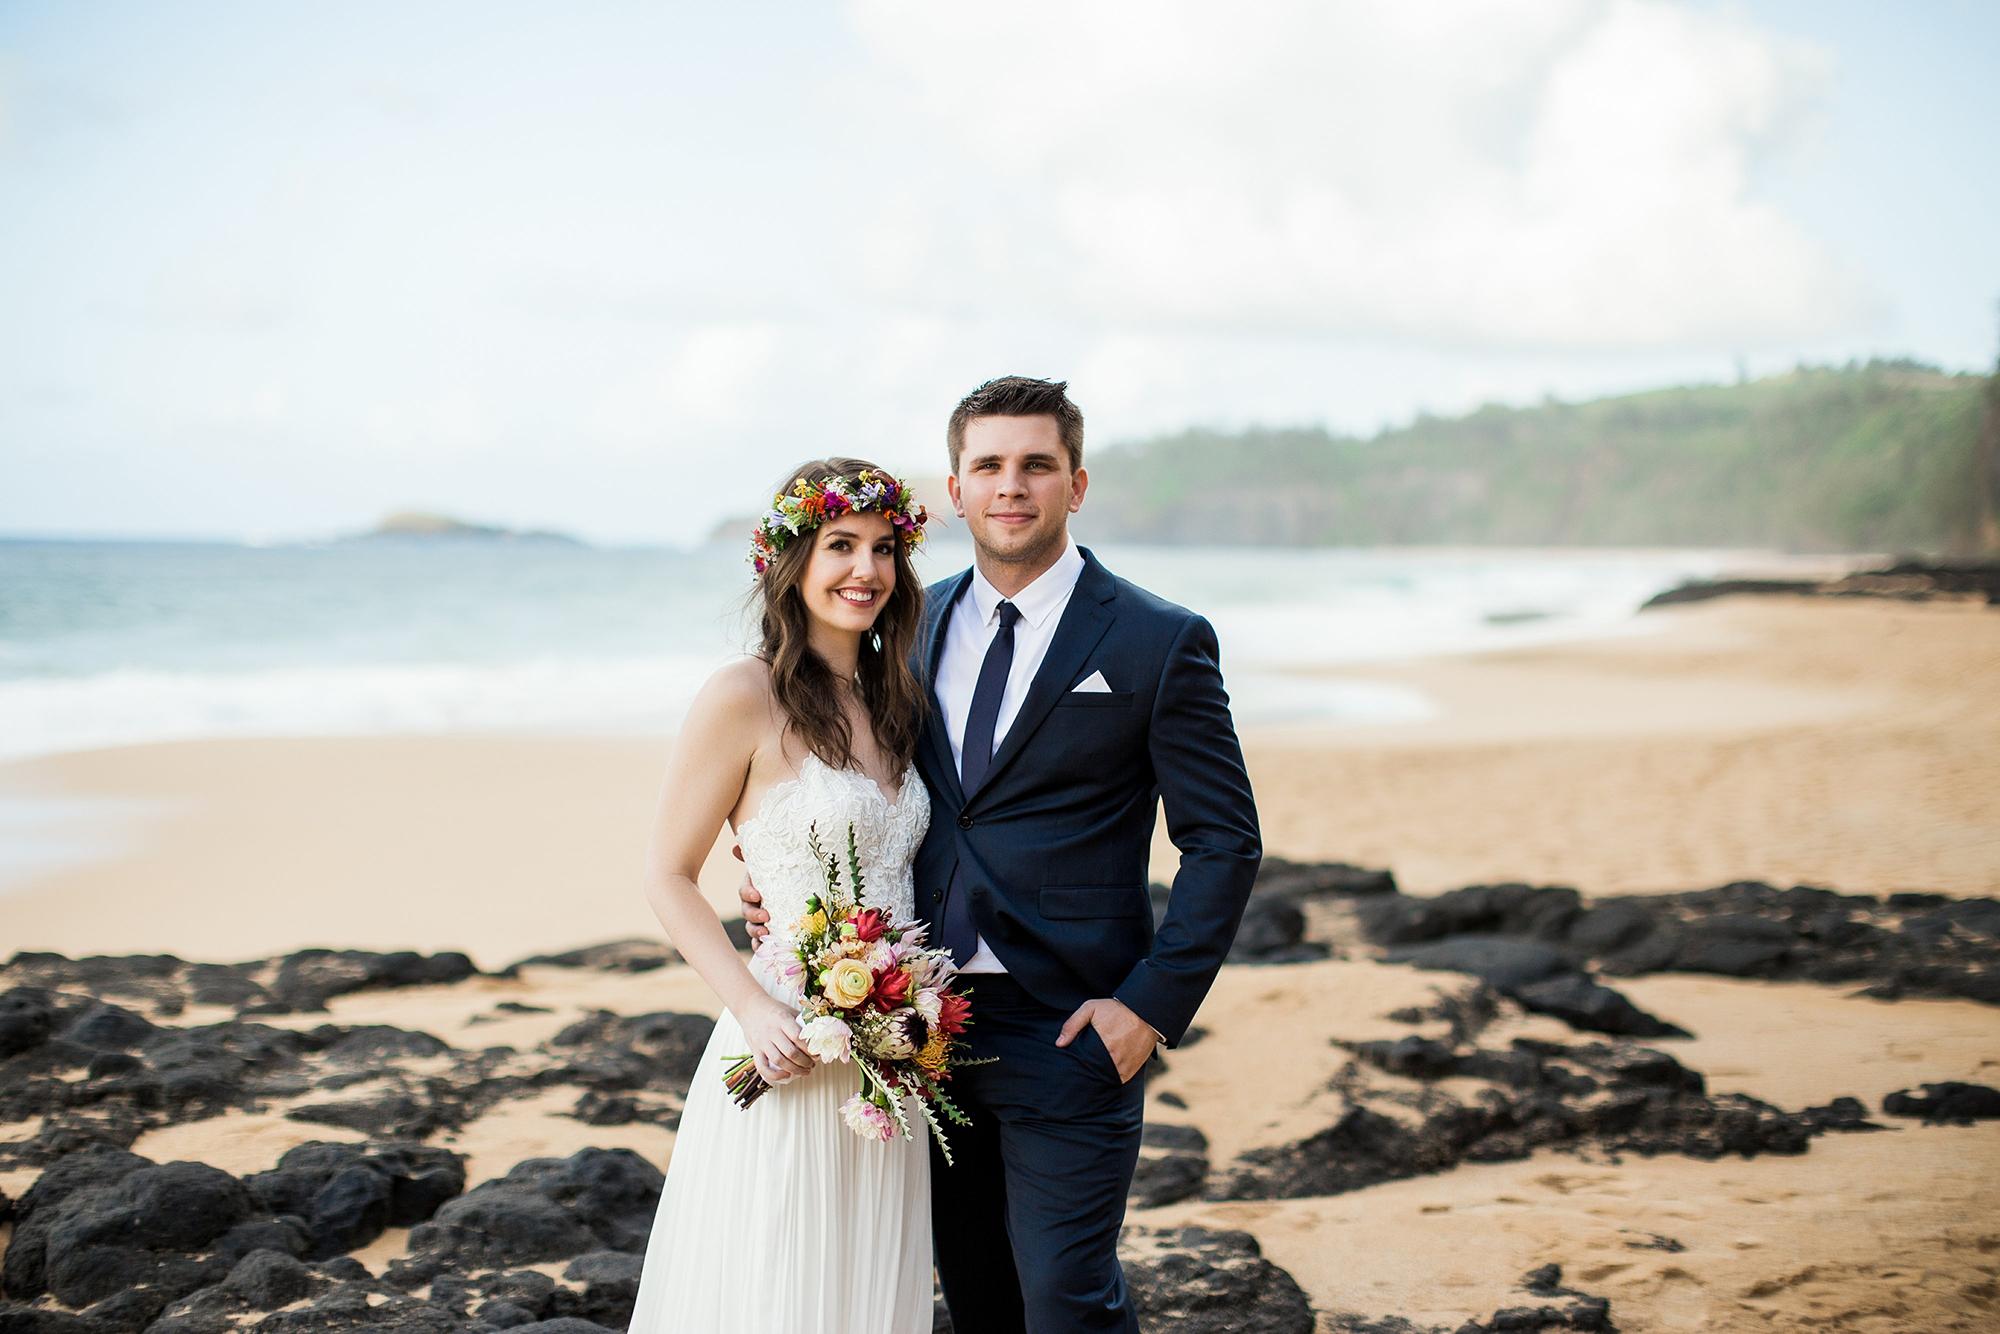 Intimate Elopement on the Beach in Kauai